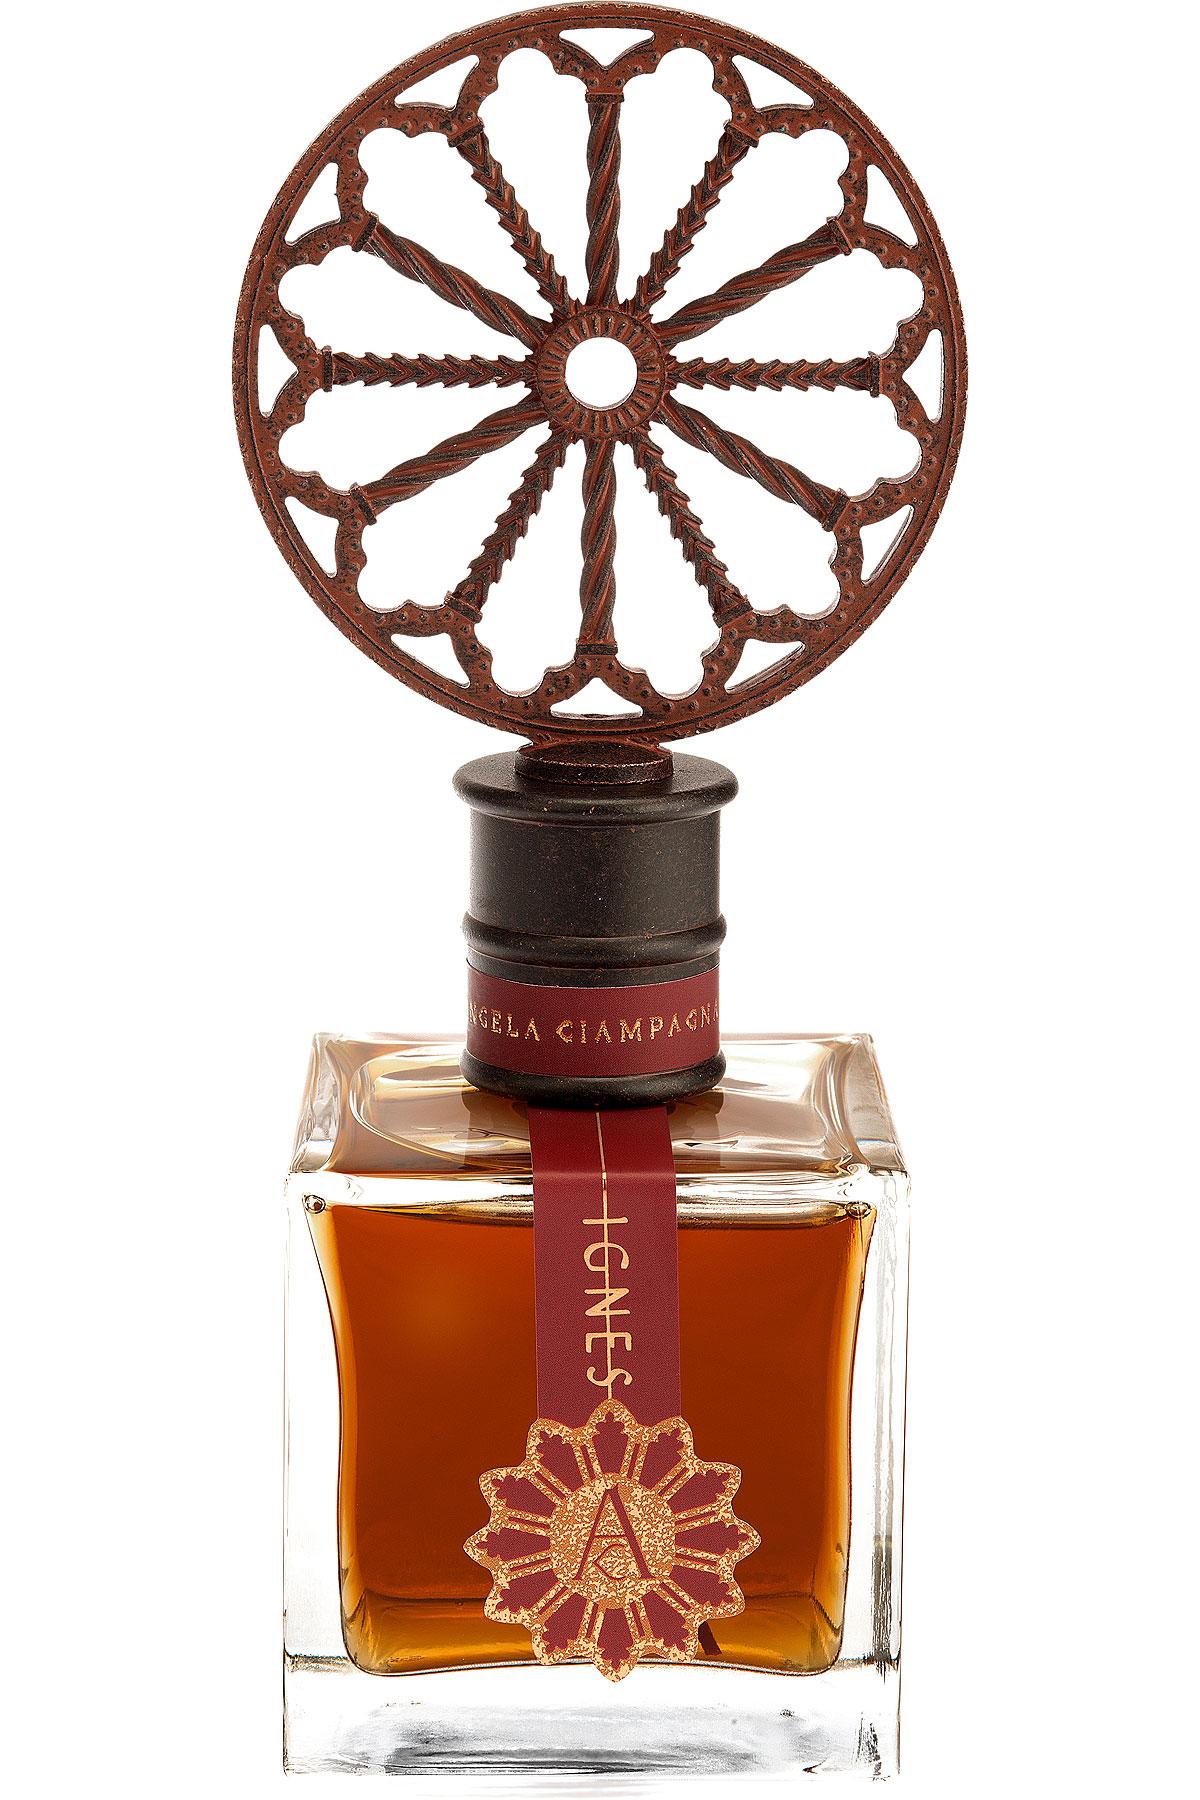 Angela Ciampagna Fragrances for Men, Ignes - Extrait De Parfum - 100 Ml, 2019, 100 ml